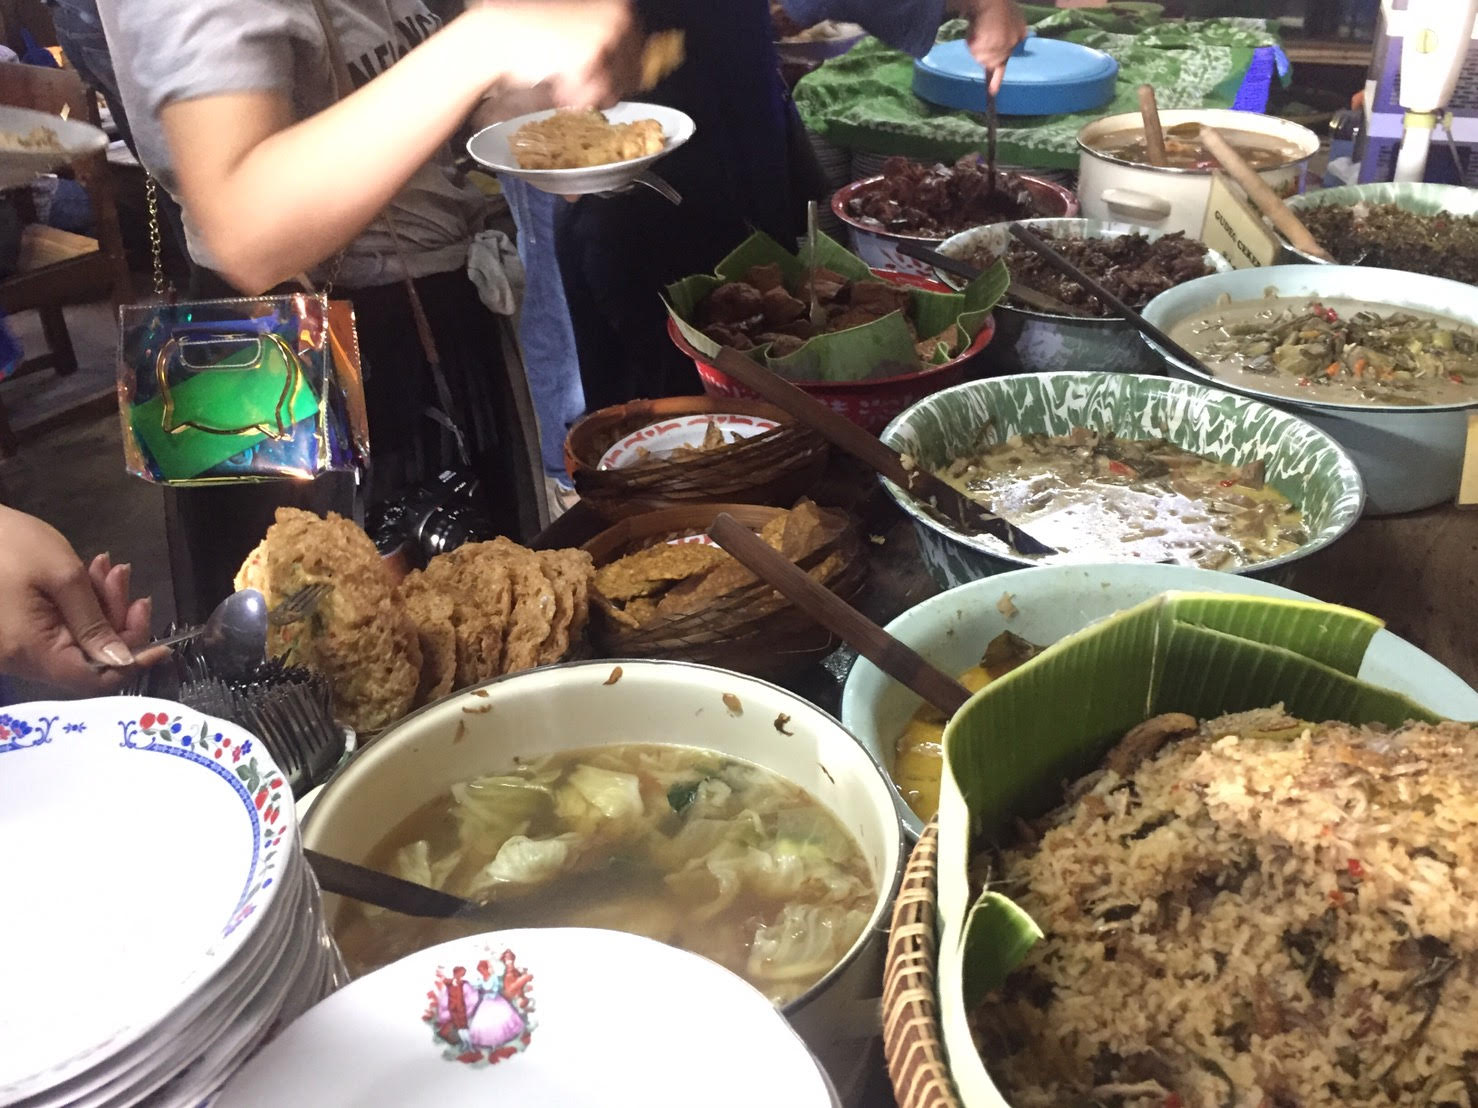 https: img.okeinfo.net content 2018 10 01 298 1957955 mencicipi-sayur-lodeh-favorit-artis-dan-tokoh-ternama-indonesia-di-kopi-klotok-zcZhsRl4SK.jpg